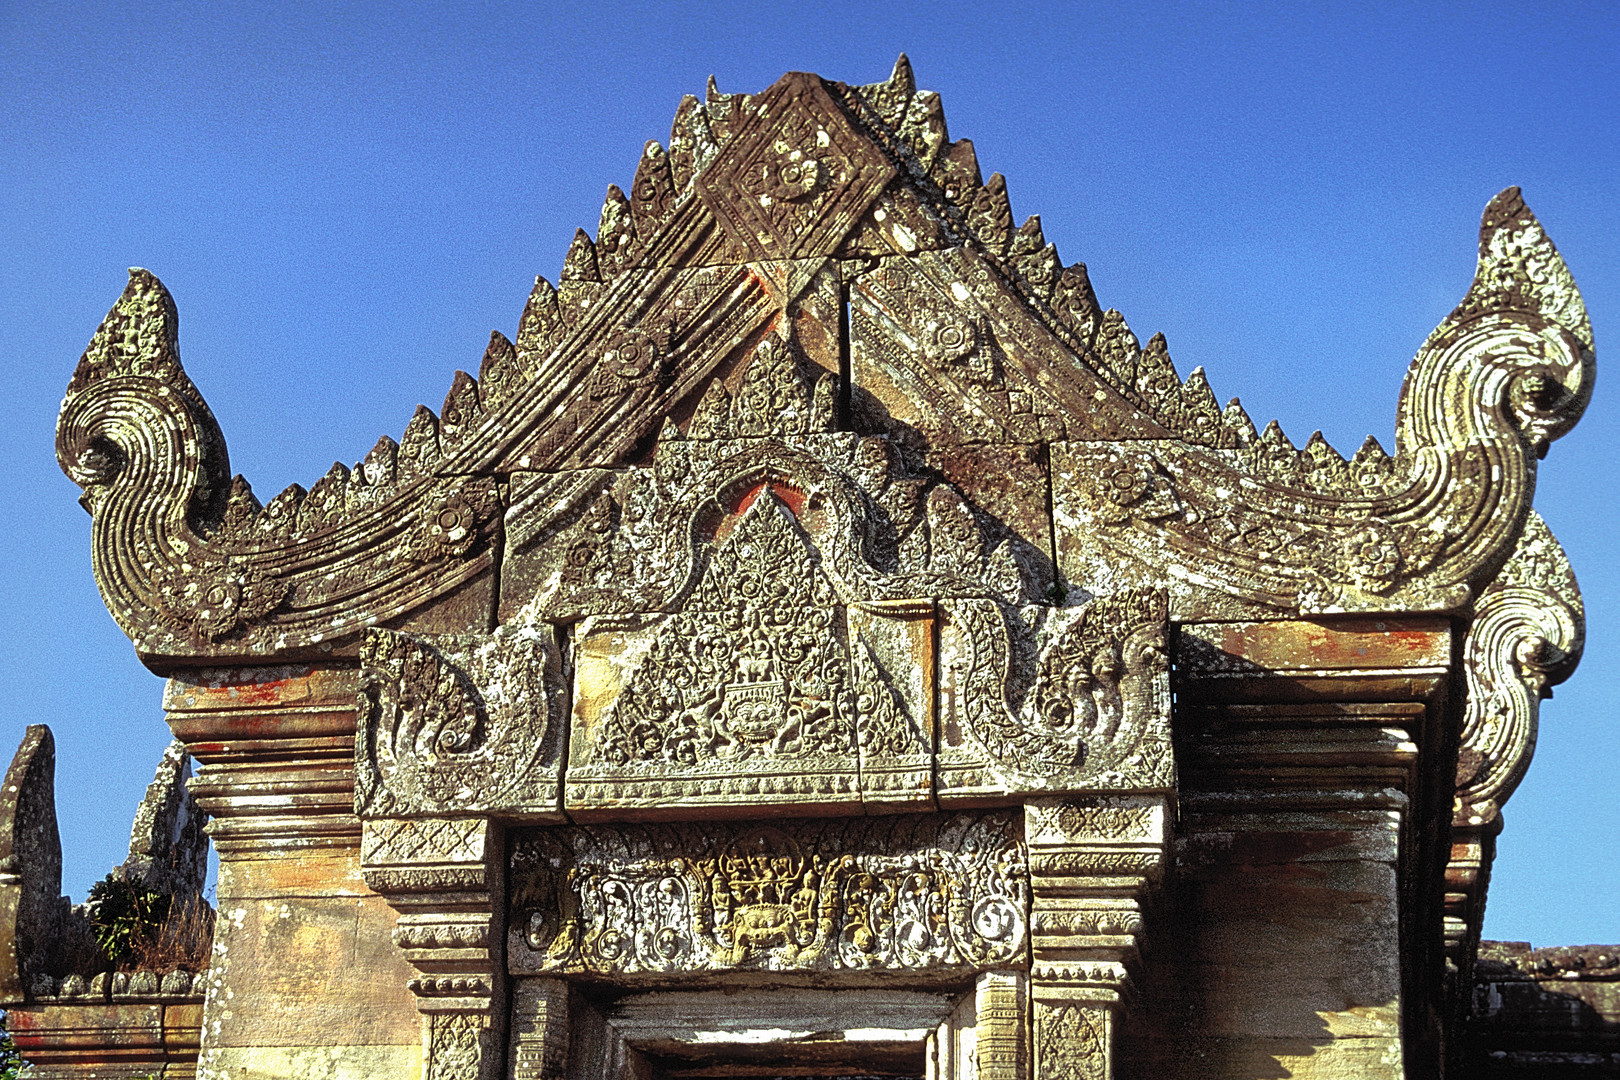 Details of the lentil carvings at Preah Vihear